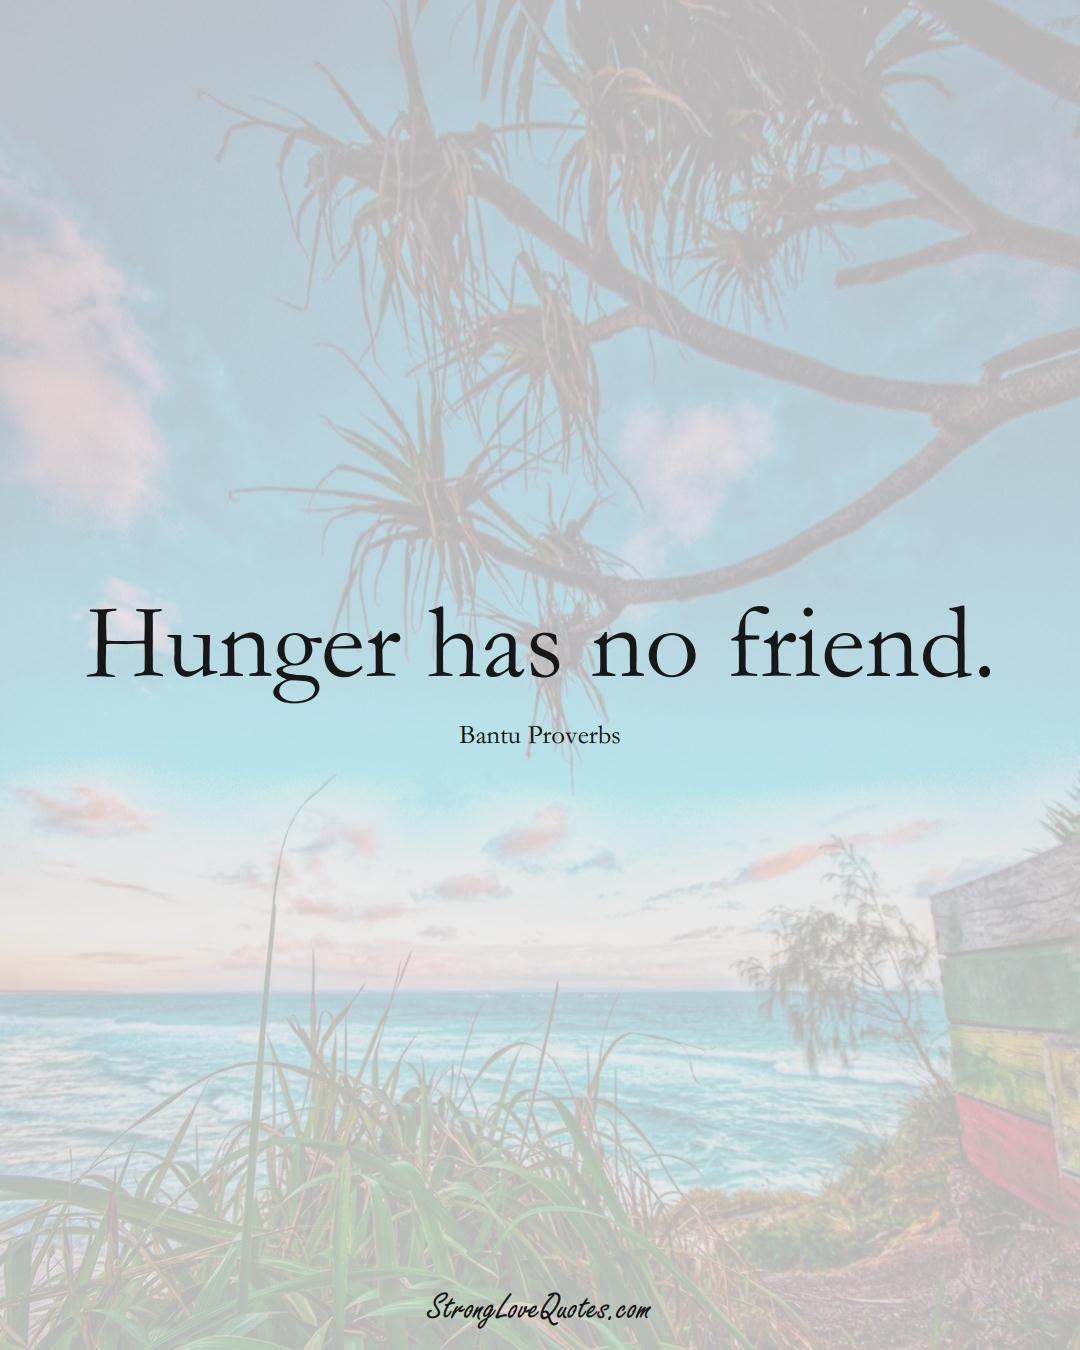 Hunger has no friend. (Bantu Sayings);  #aVarietyofCulturesSayings